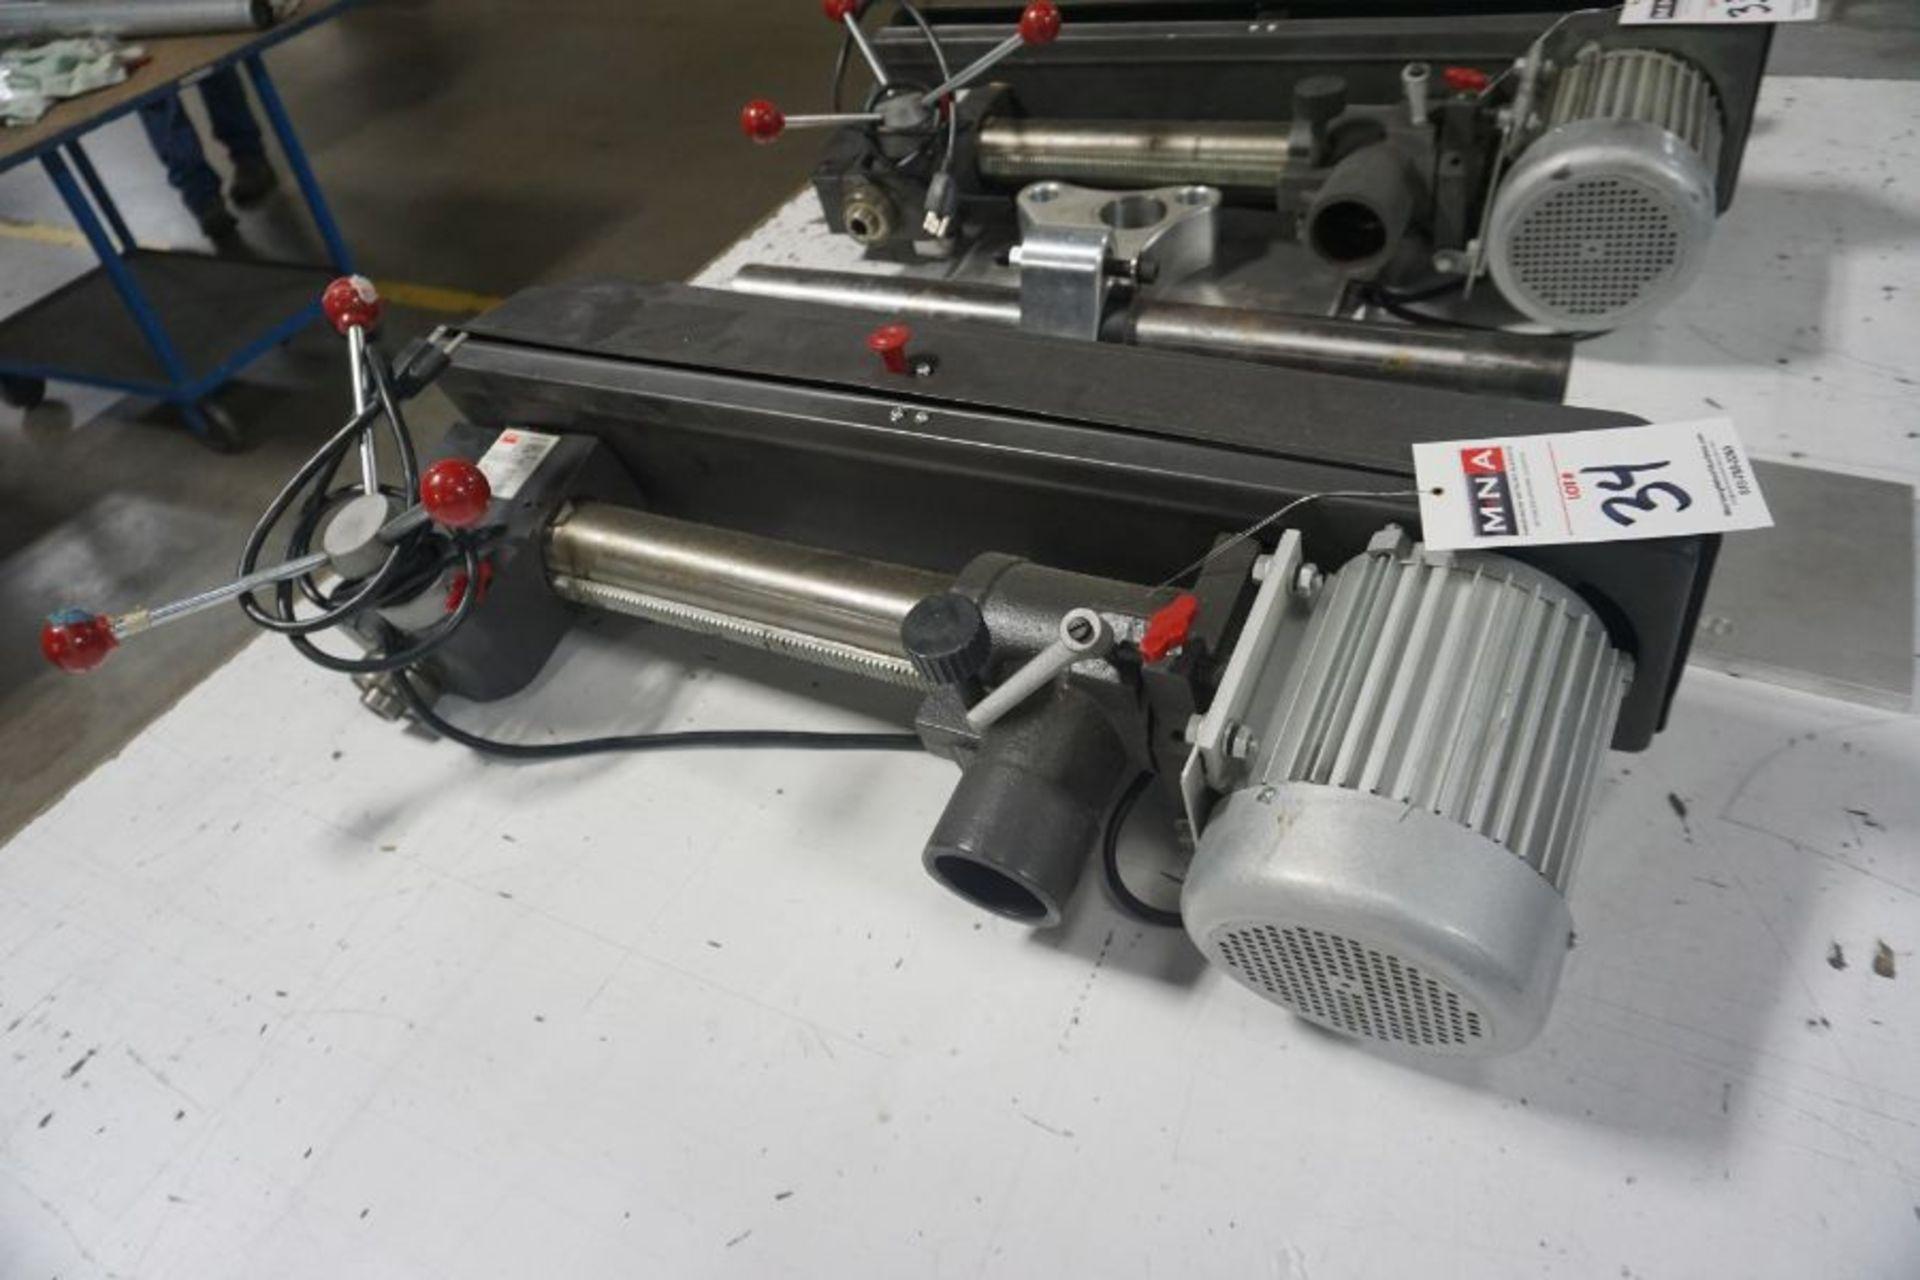 Dayton 33'' Radial Arm Drill Press - Image 5 of 5